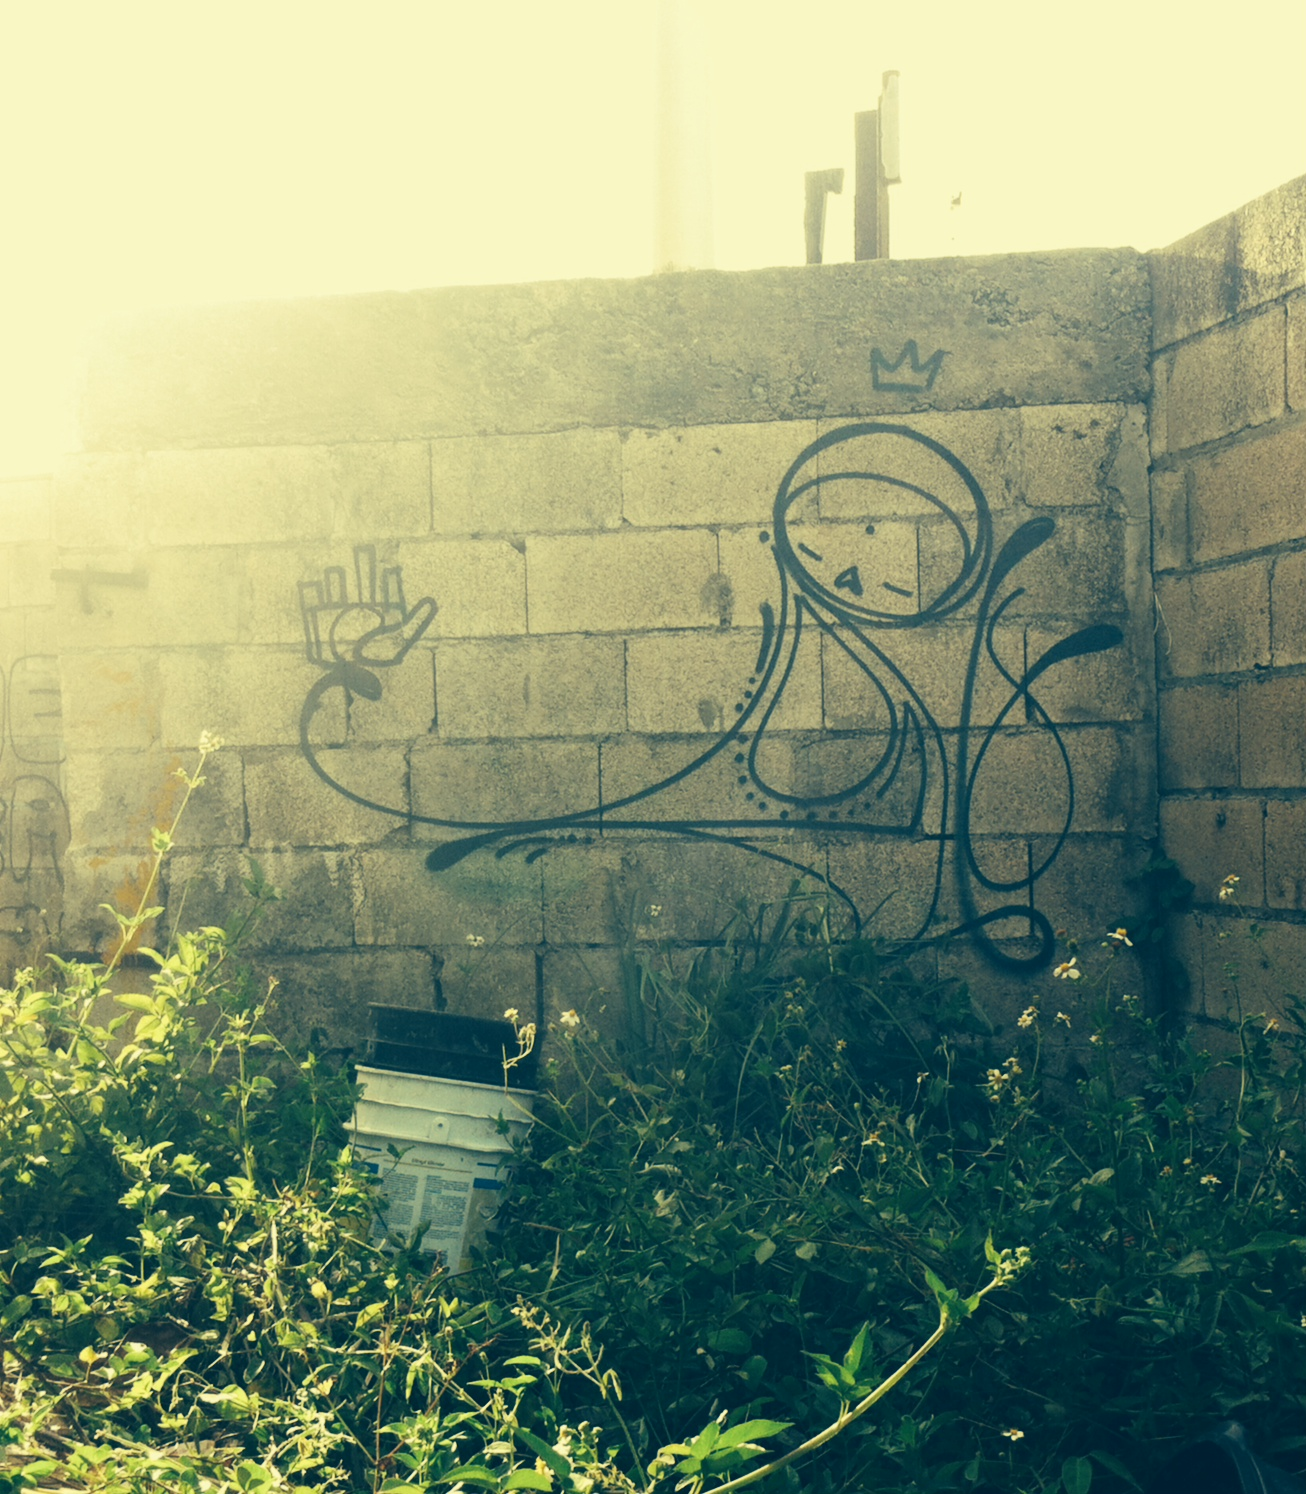 matthew reid hswam graffiti puerto rico